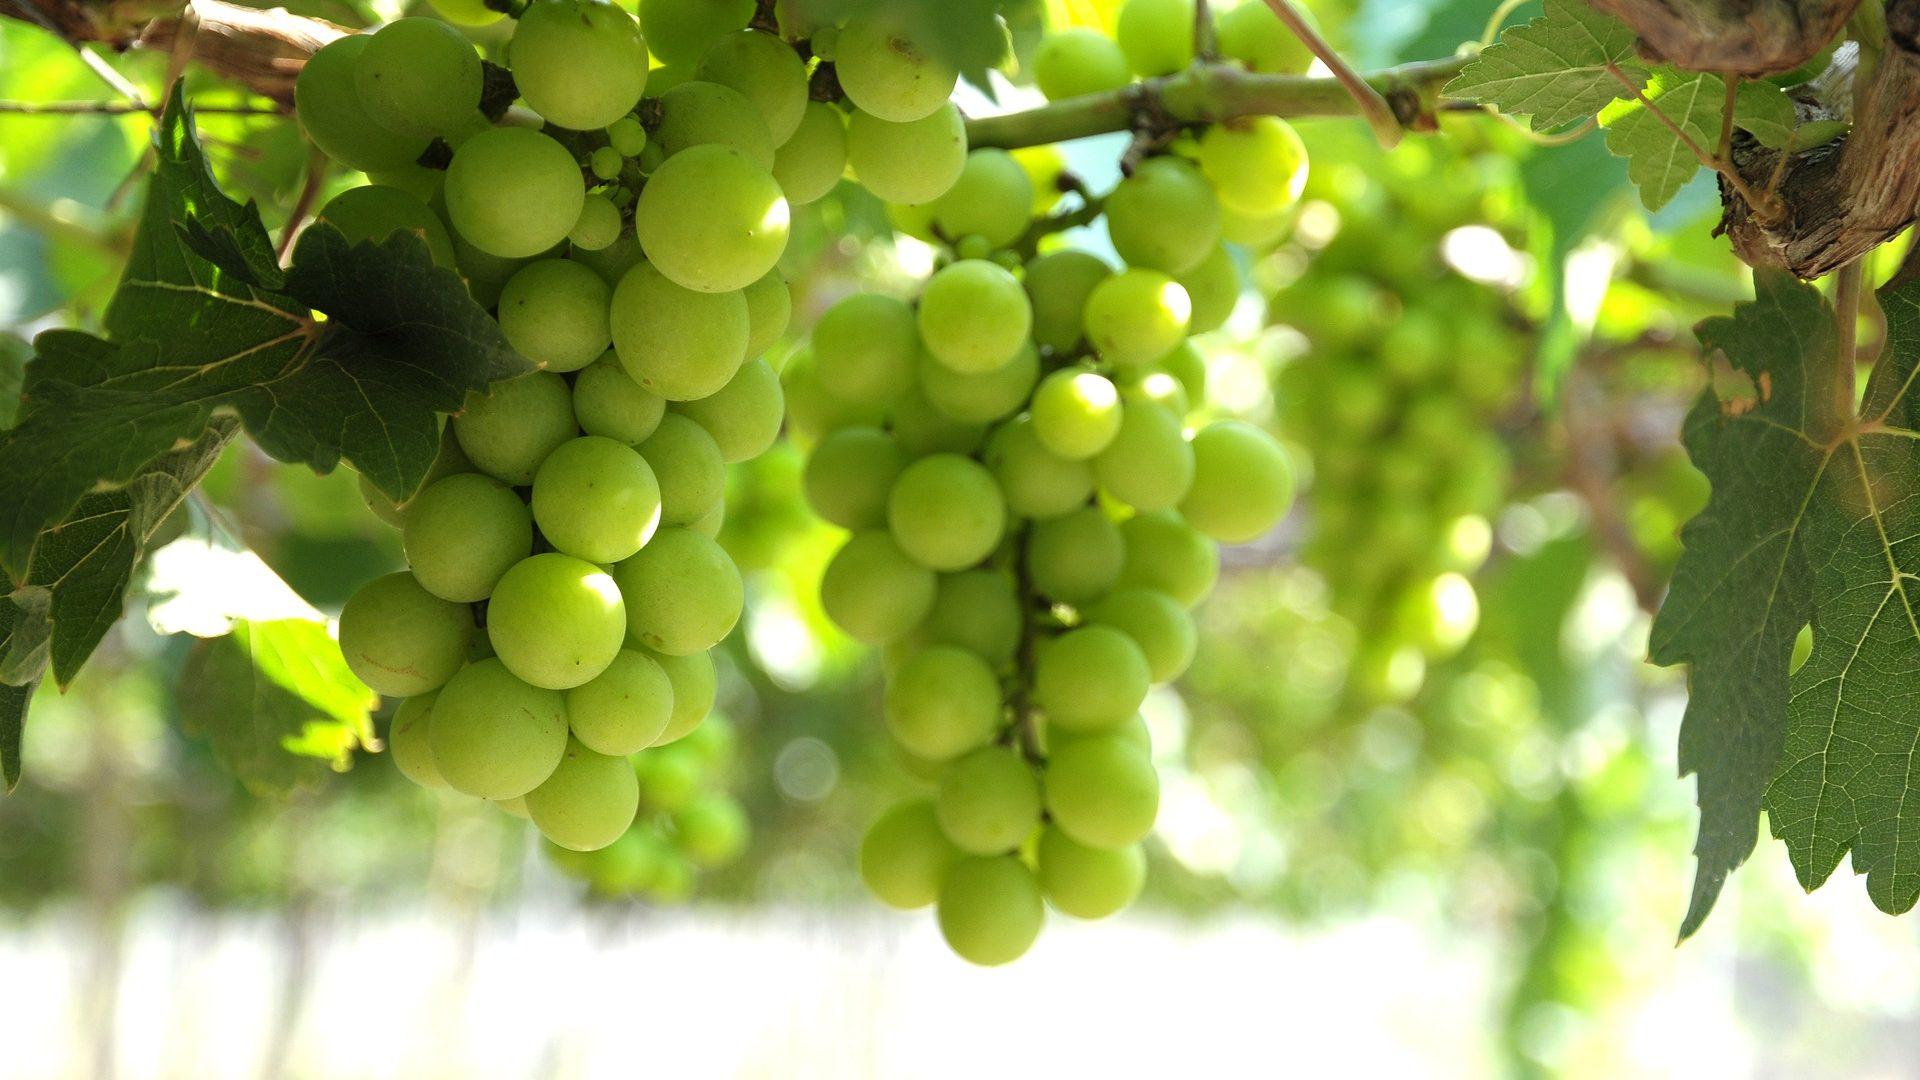 grapes-4239837_1920